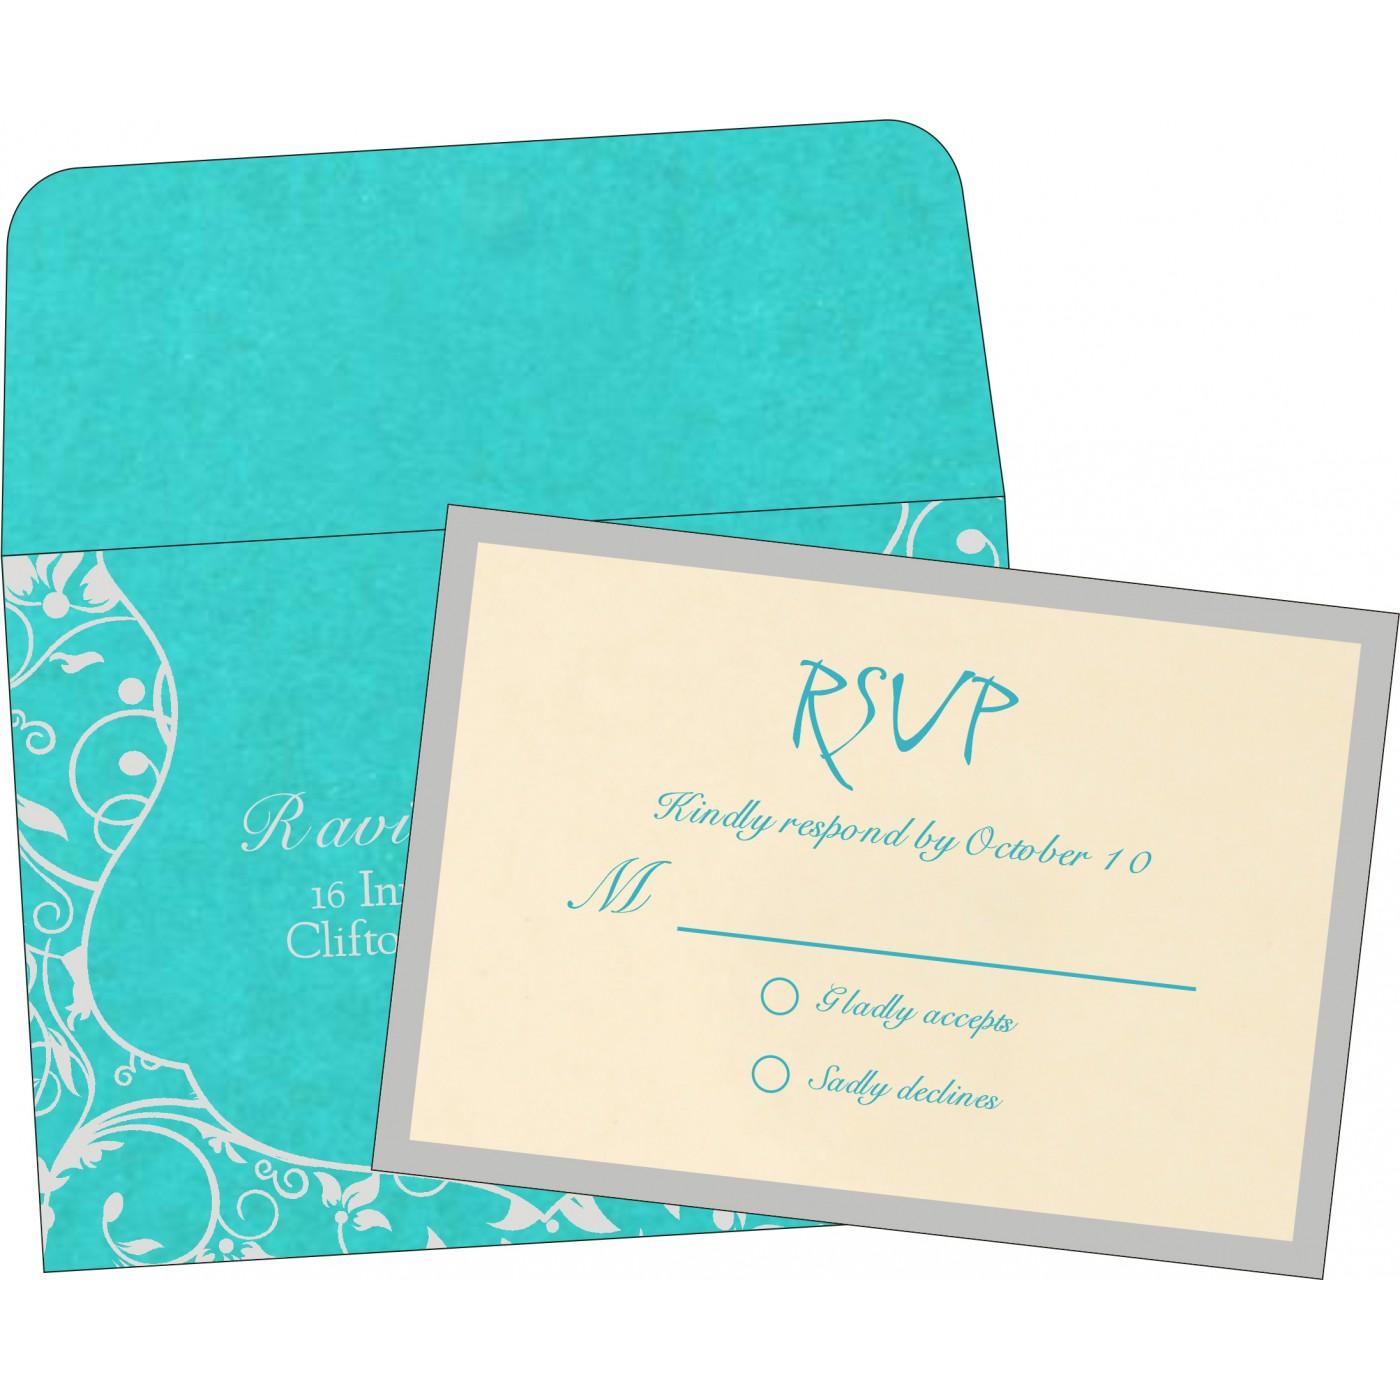 RSVP Cards : RSVP-8229M - 123WeddingCards